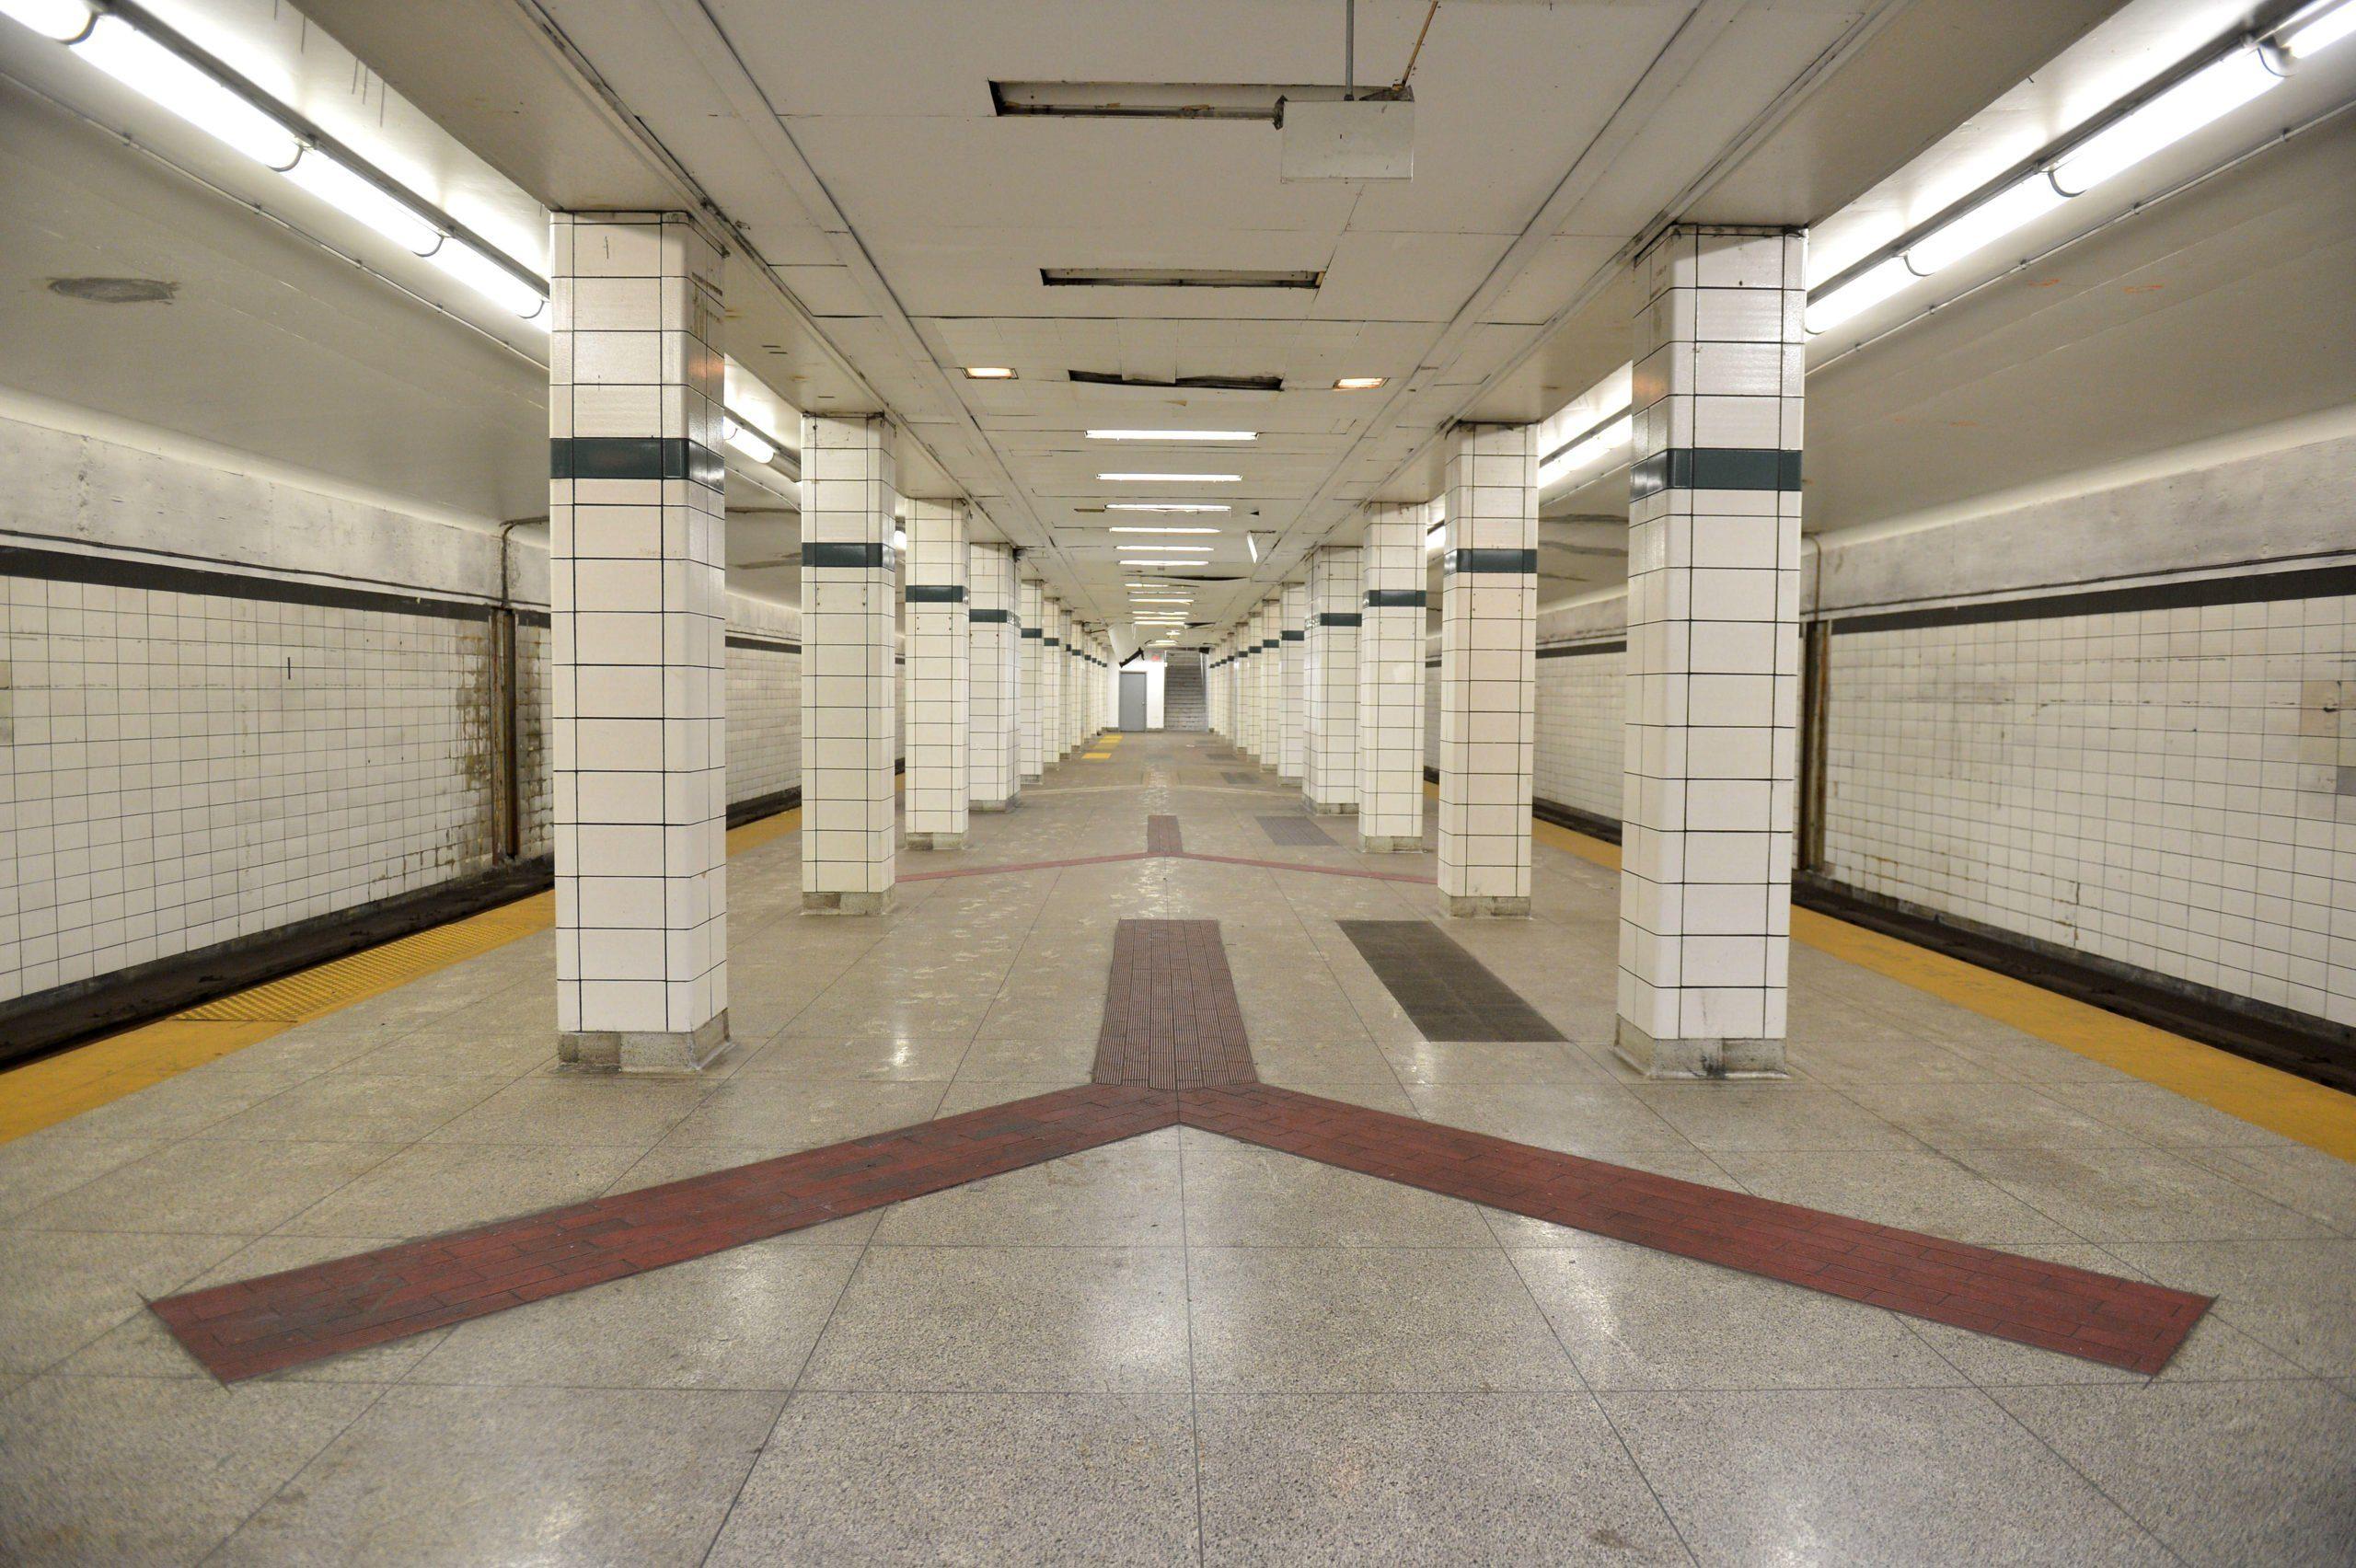 TTC Bay Lower Subway Station